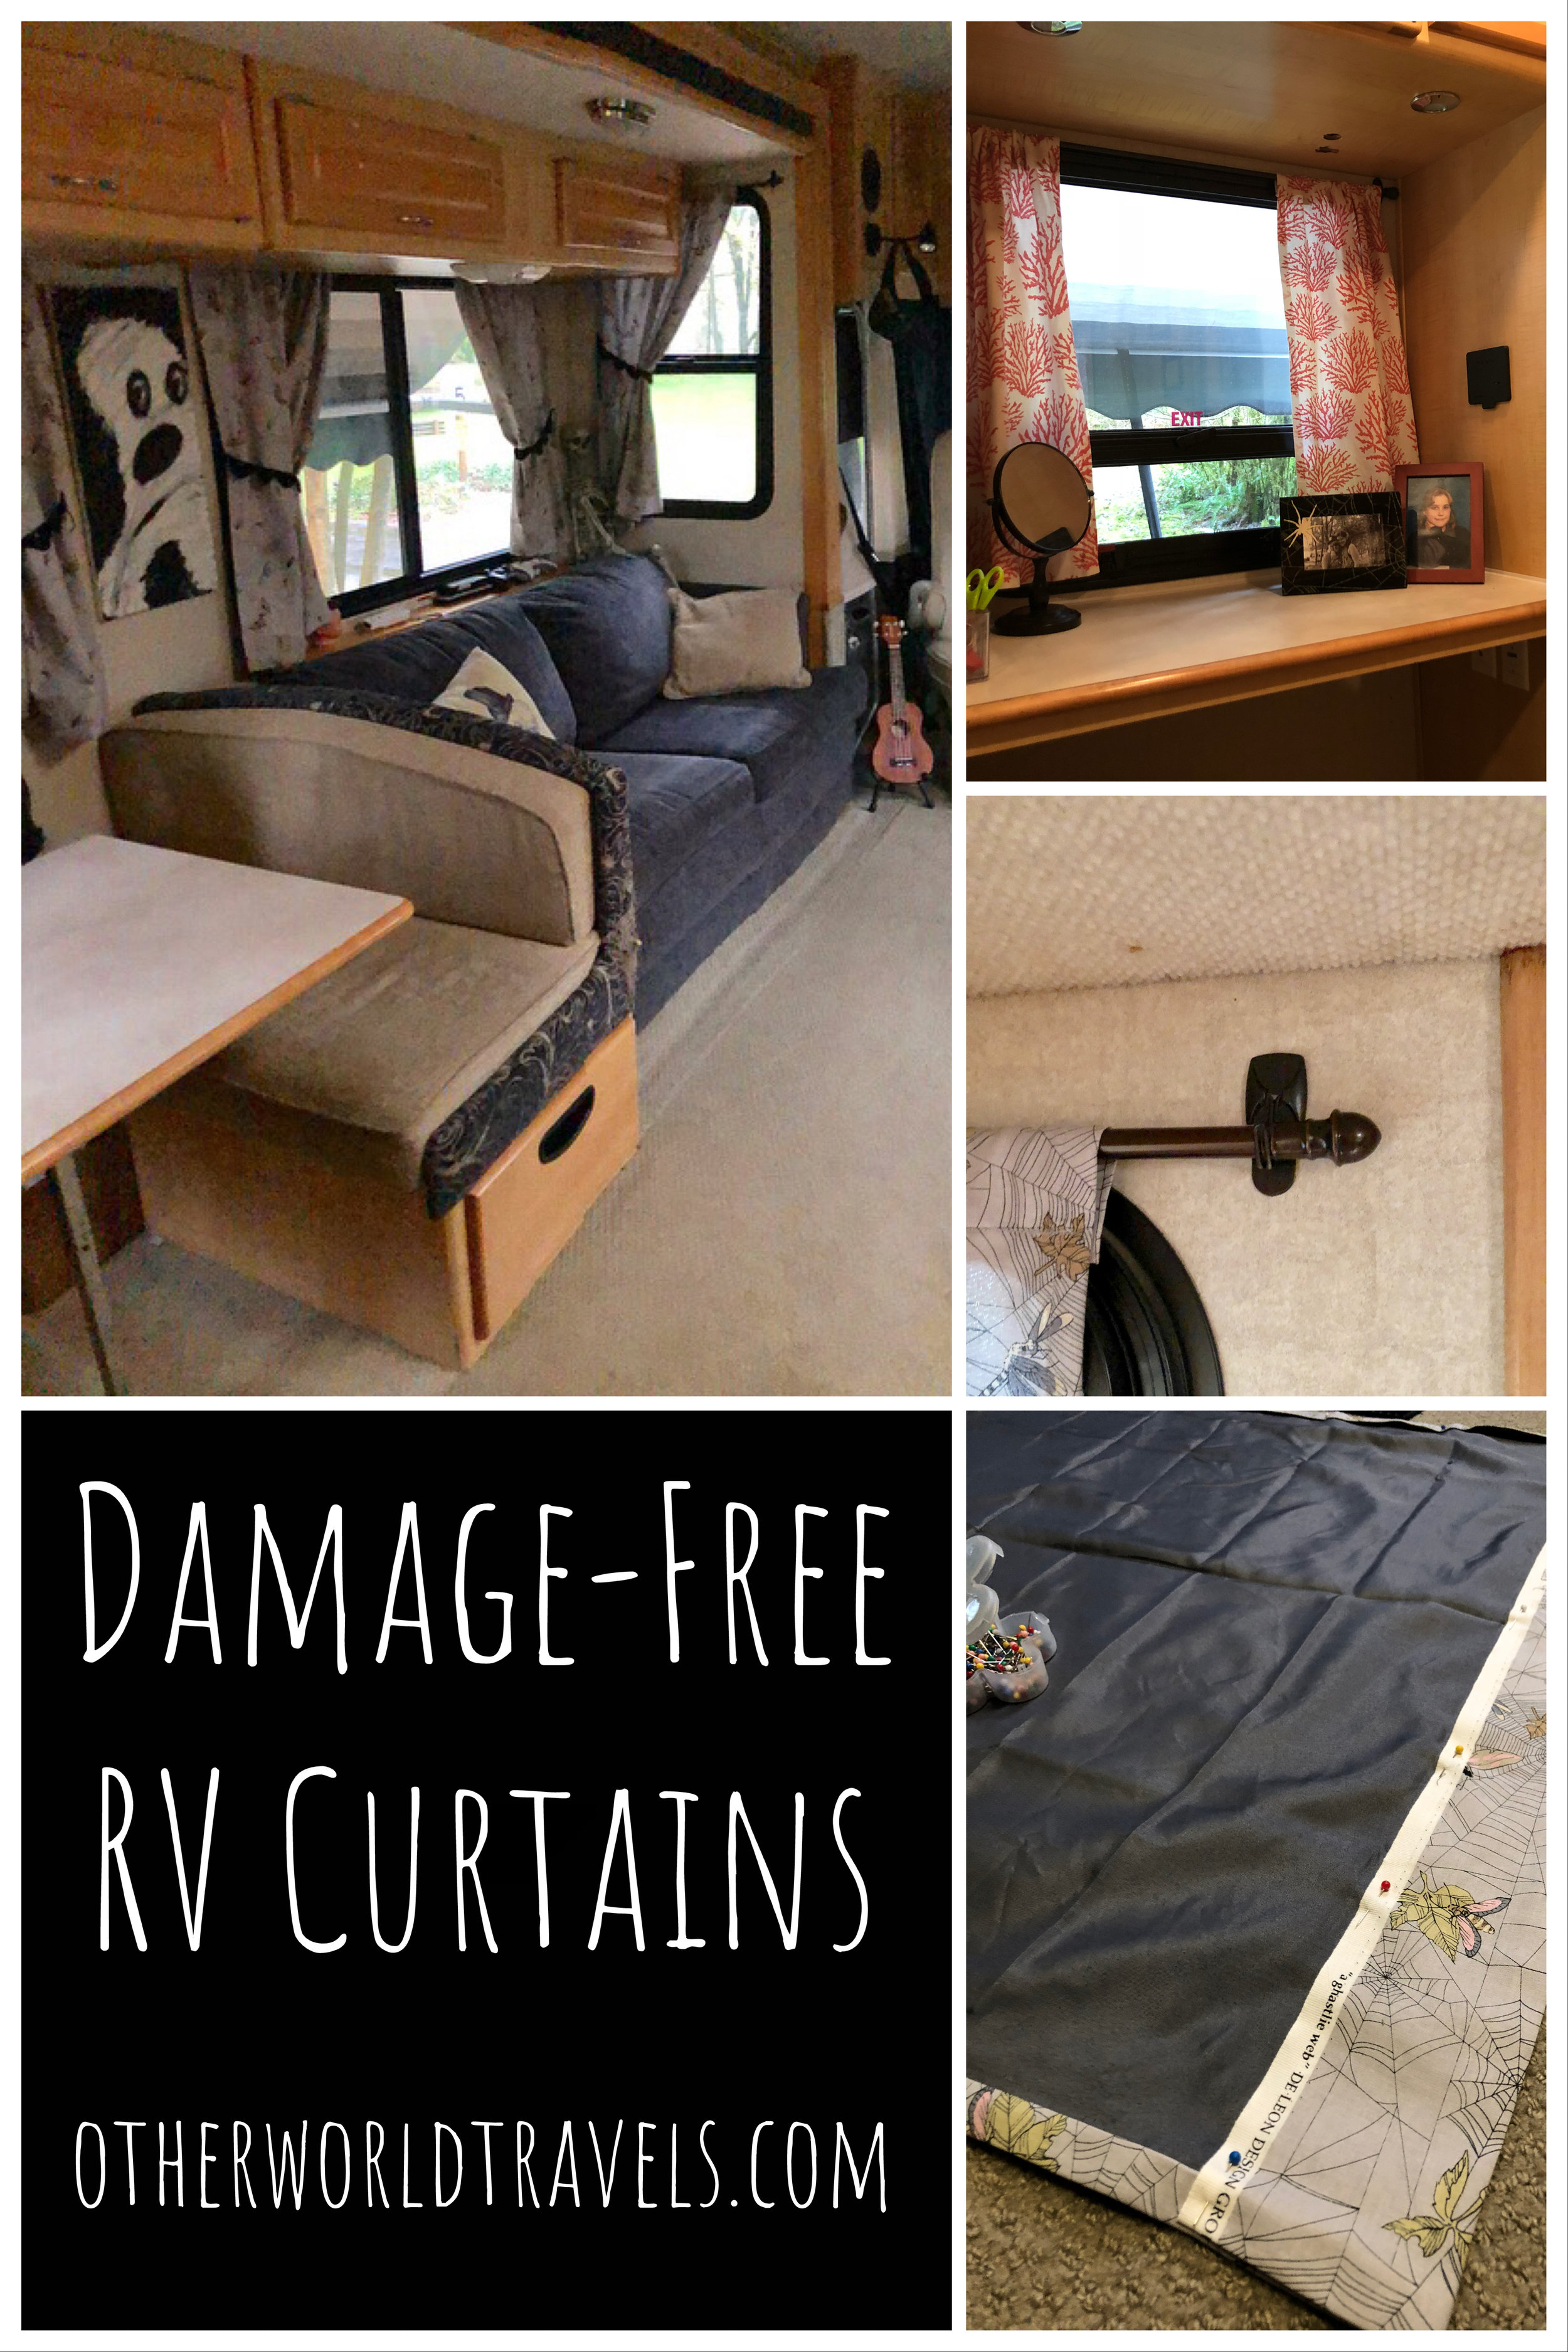 Damage Free Rv Curtains Otherworld Travels